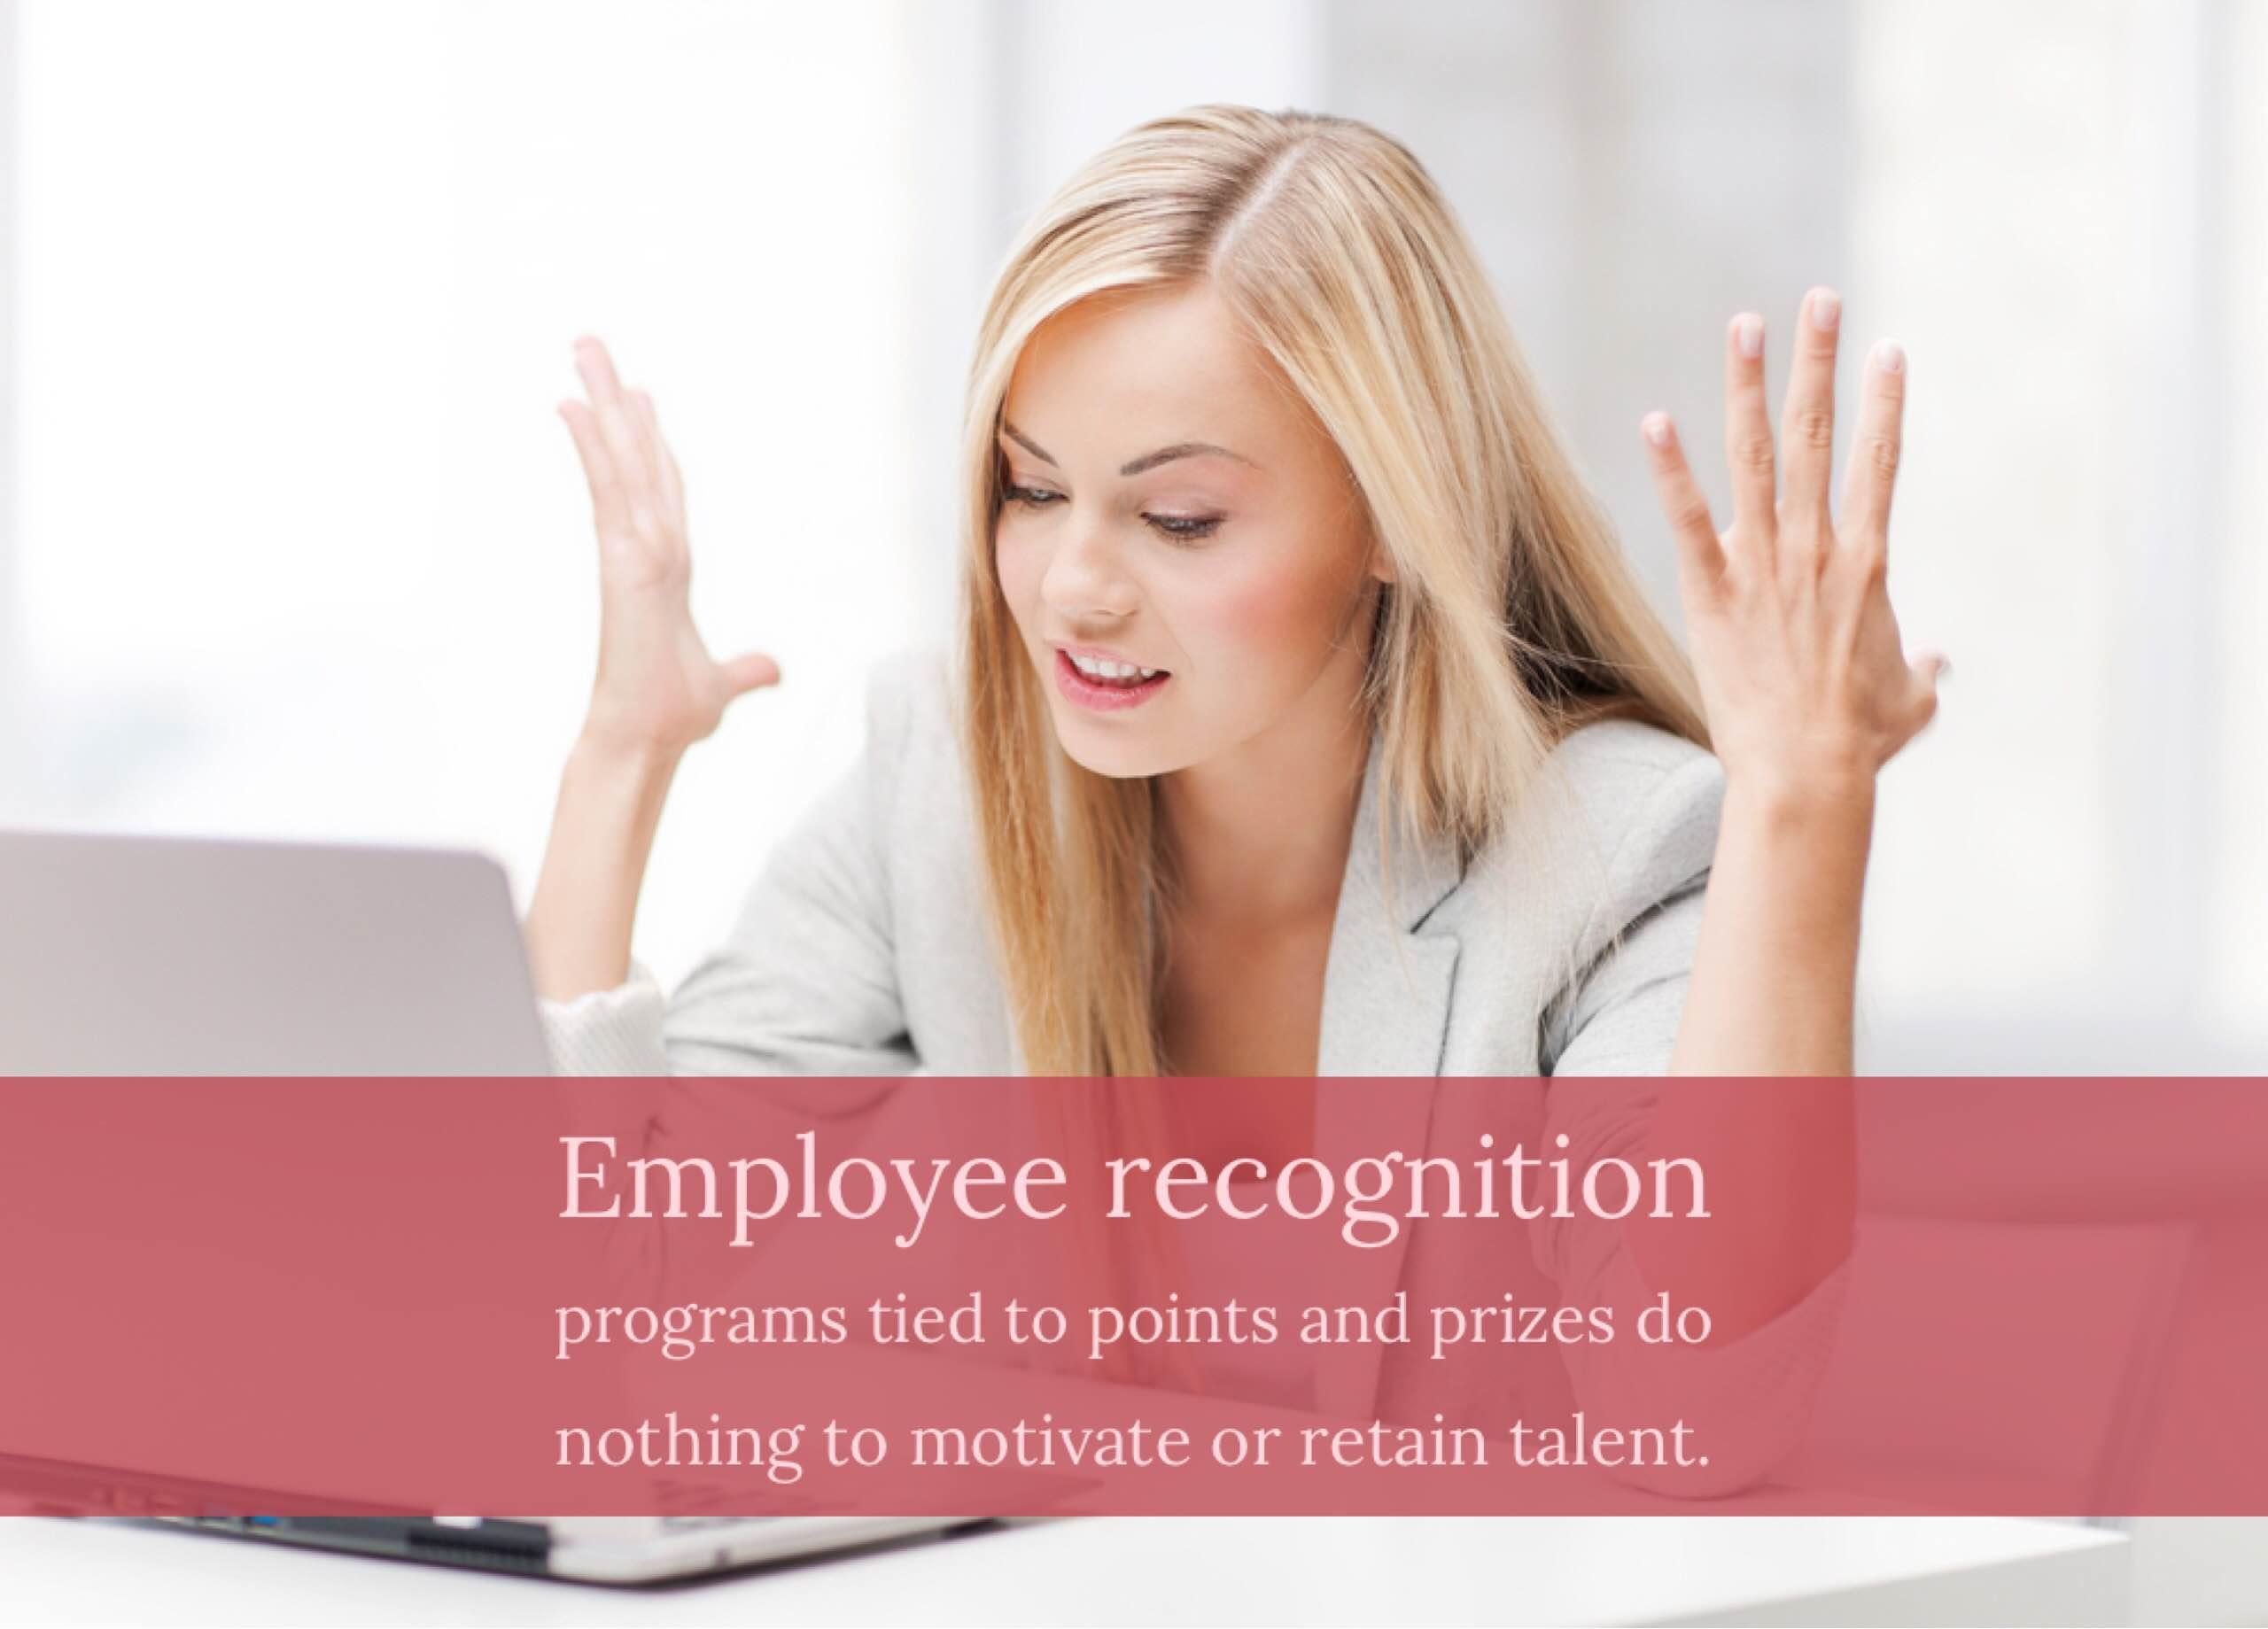 Media mention: Building employee recognition programs - HR.com